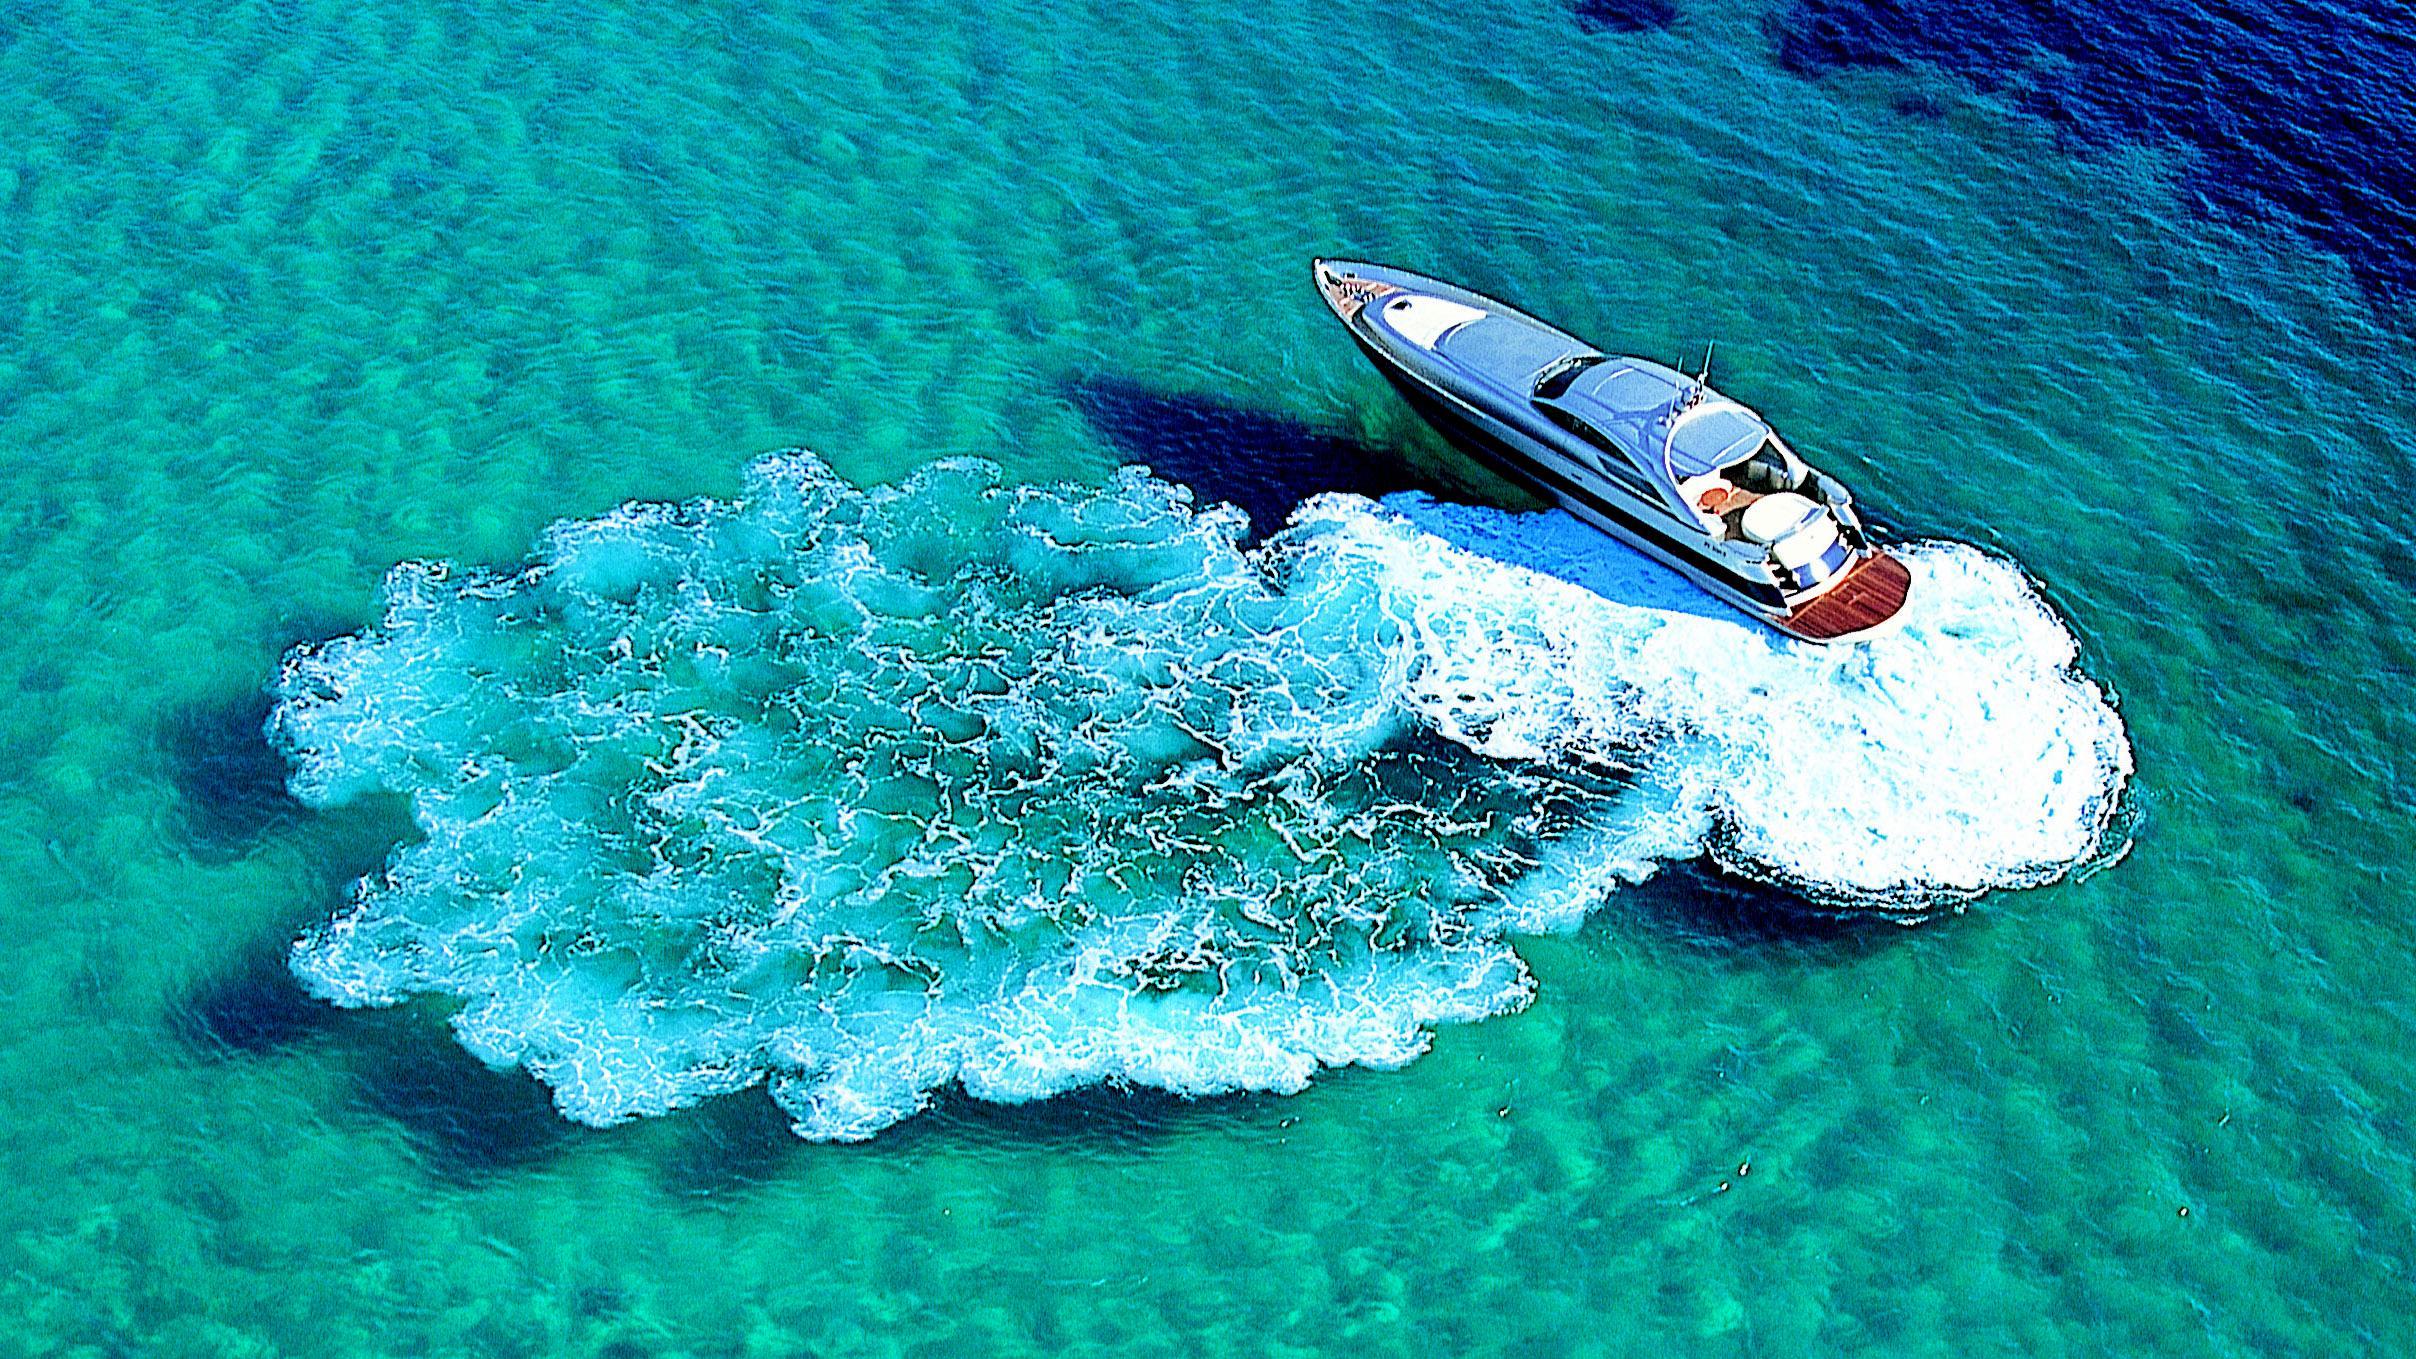 la-cima-ii-motor-yacht-pershing-88-2004-27m-aerial